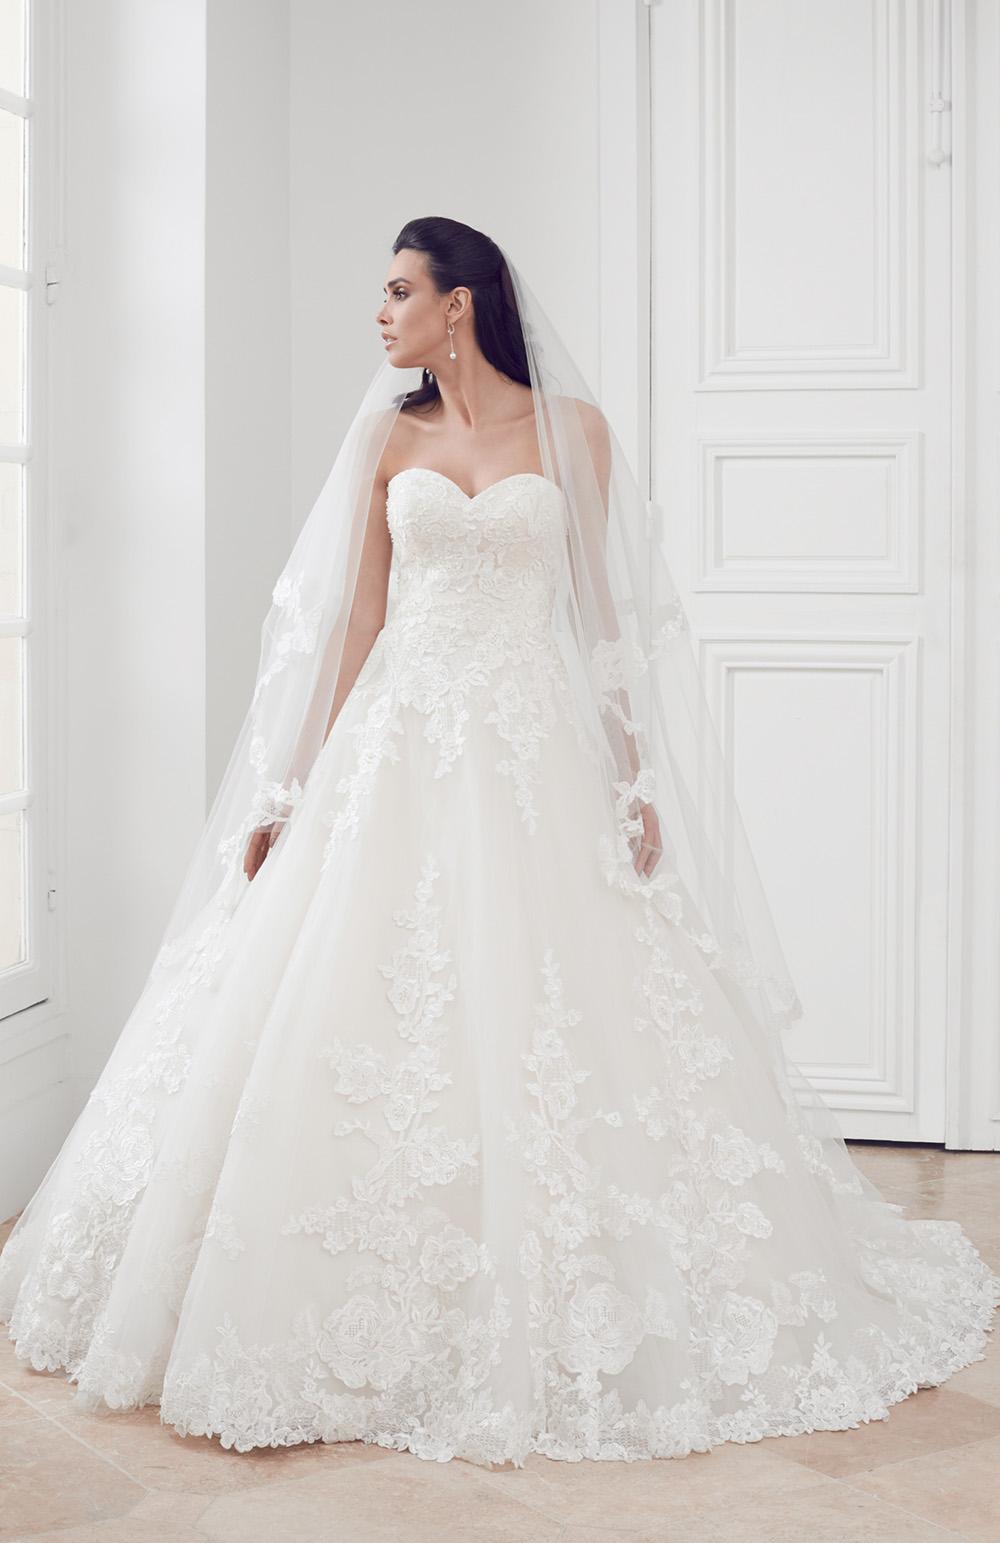 Robe de mariée Modèle Onélia